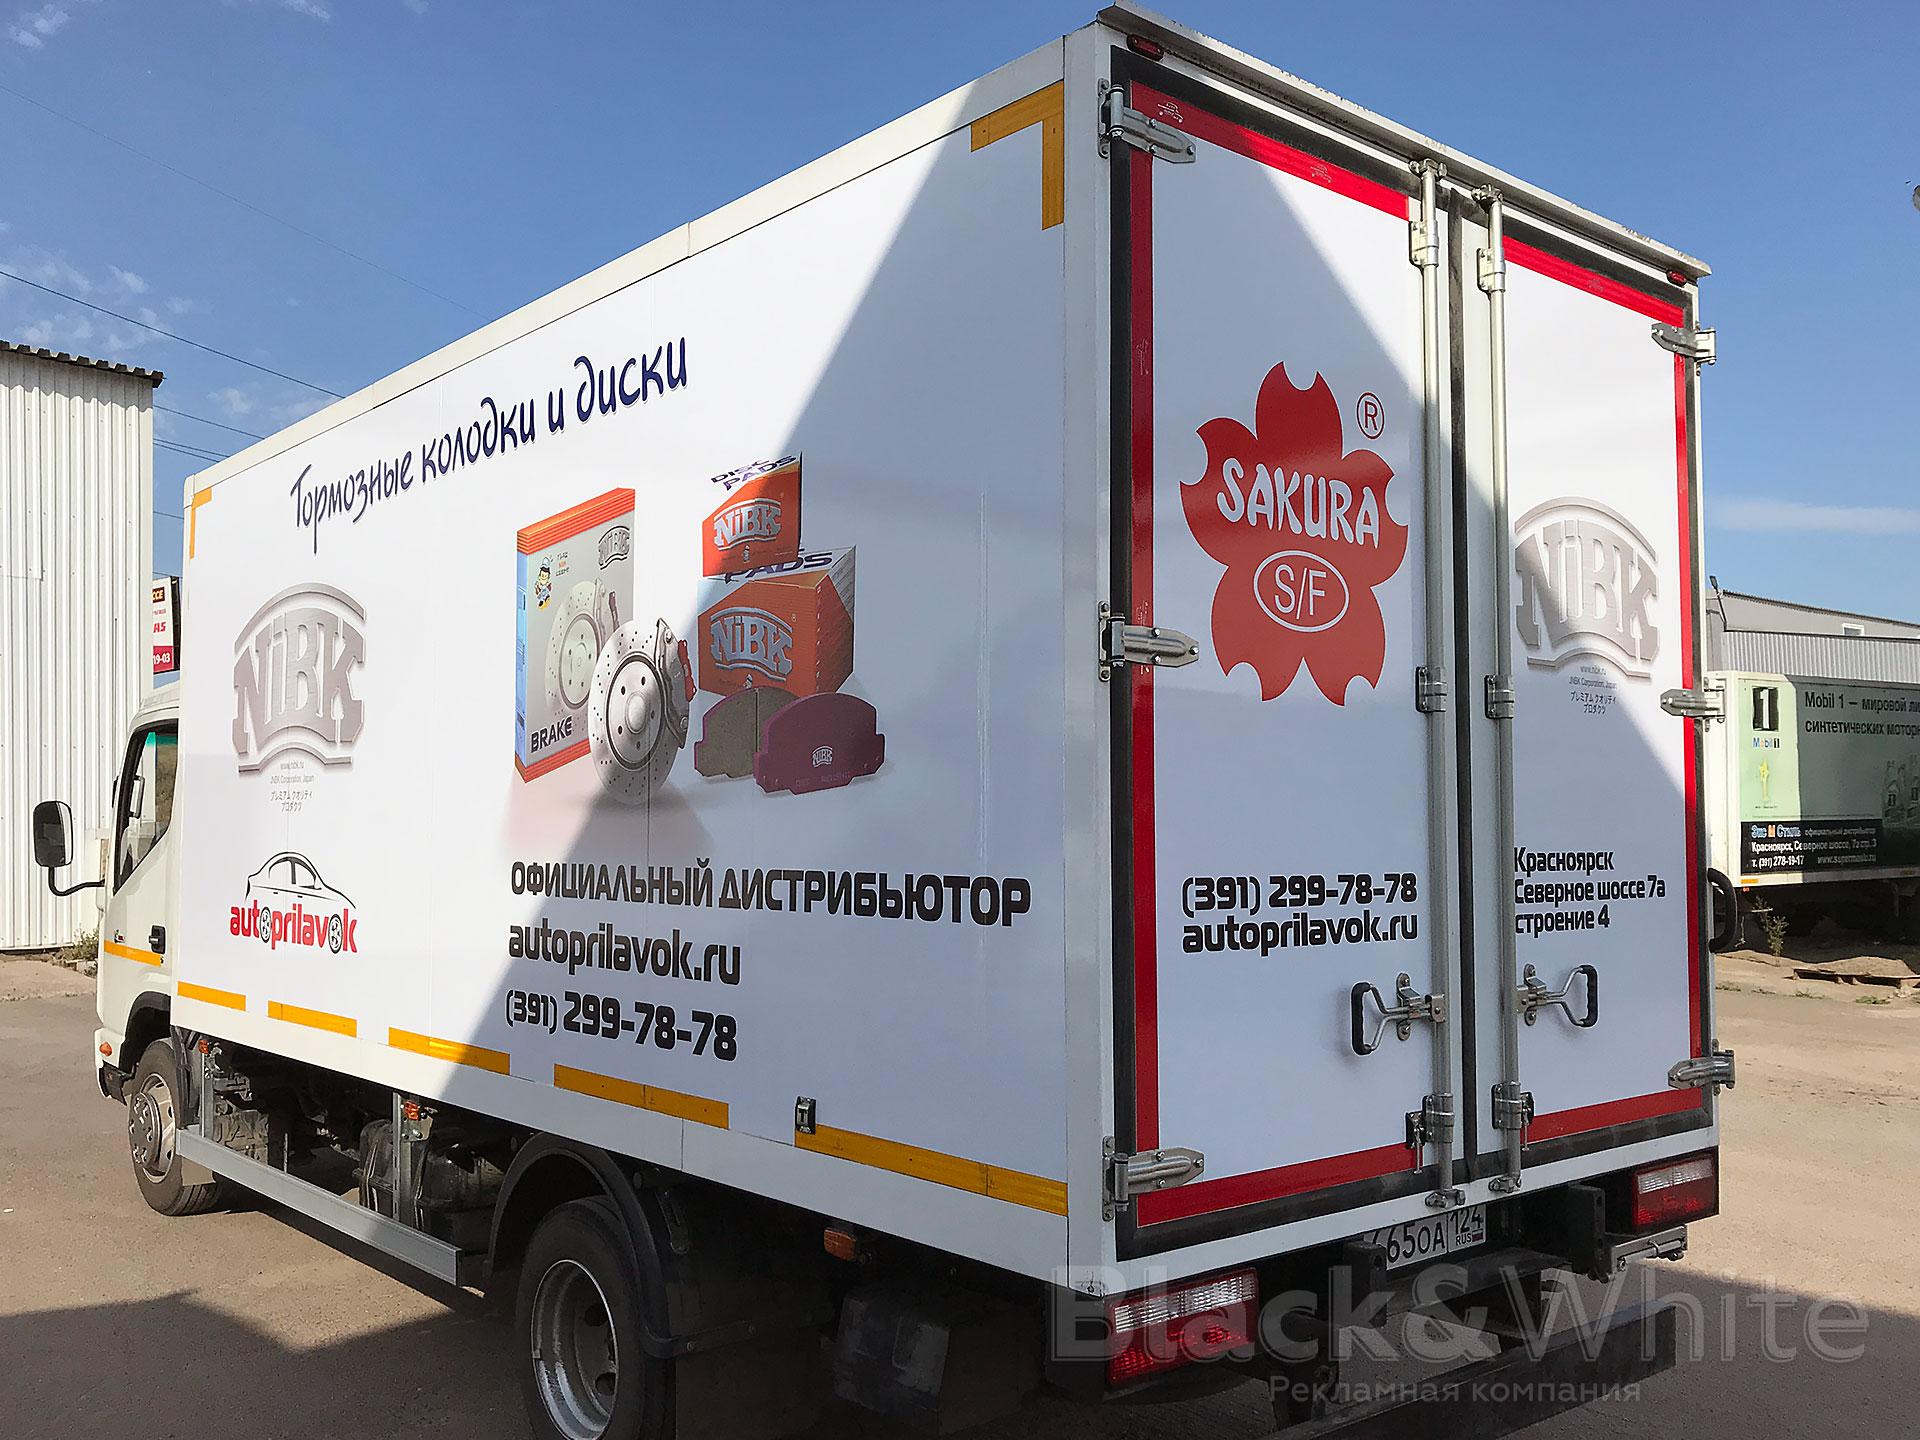 2-Брендирование-и-оклейка-грузовых-автомобилей-brendirovanie-gruzovyix-avtomobilej-Black&White.jpg